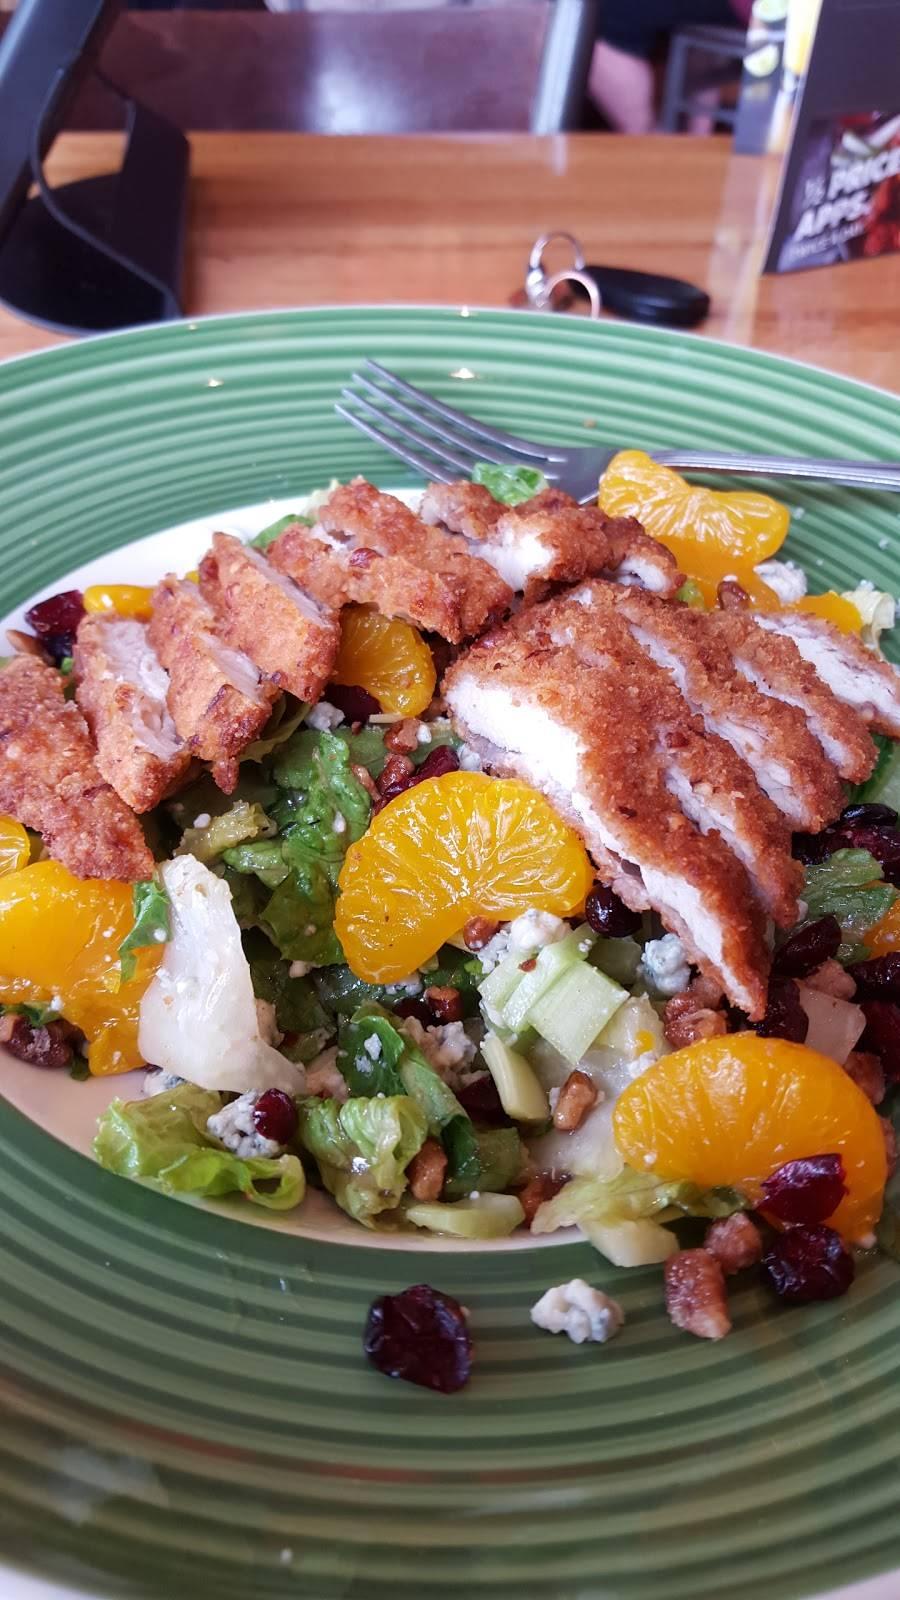 Applebees Grill + Bar | restaurant | 125 N Plano Rd, Richardson, TX 75081, USA | 9722389591 OR +1 972-238-9591